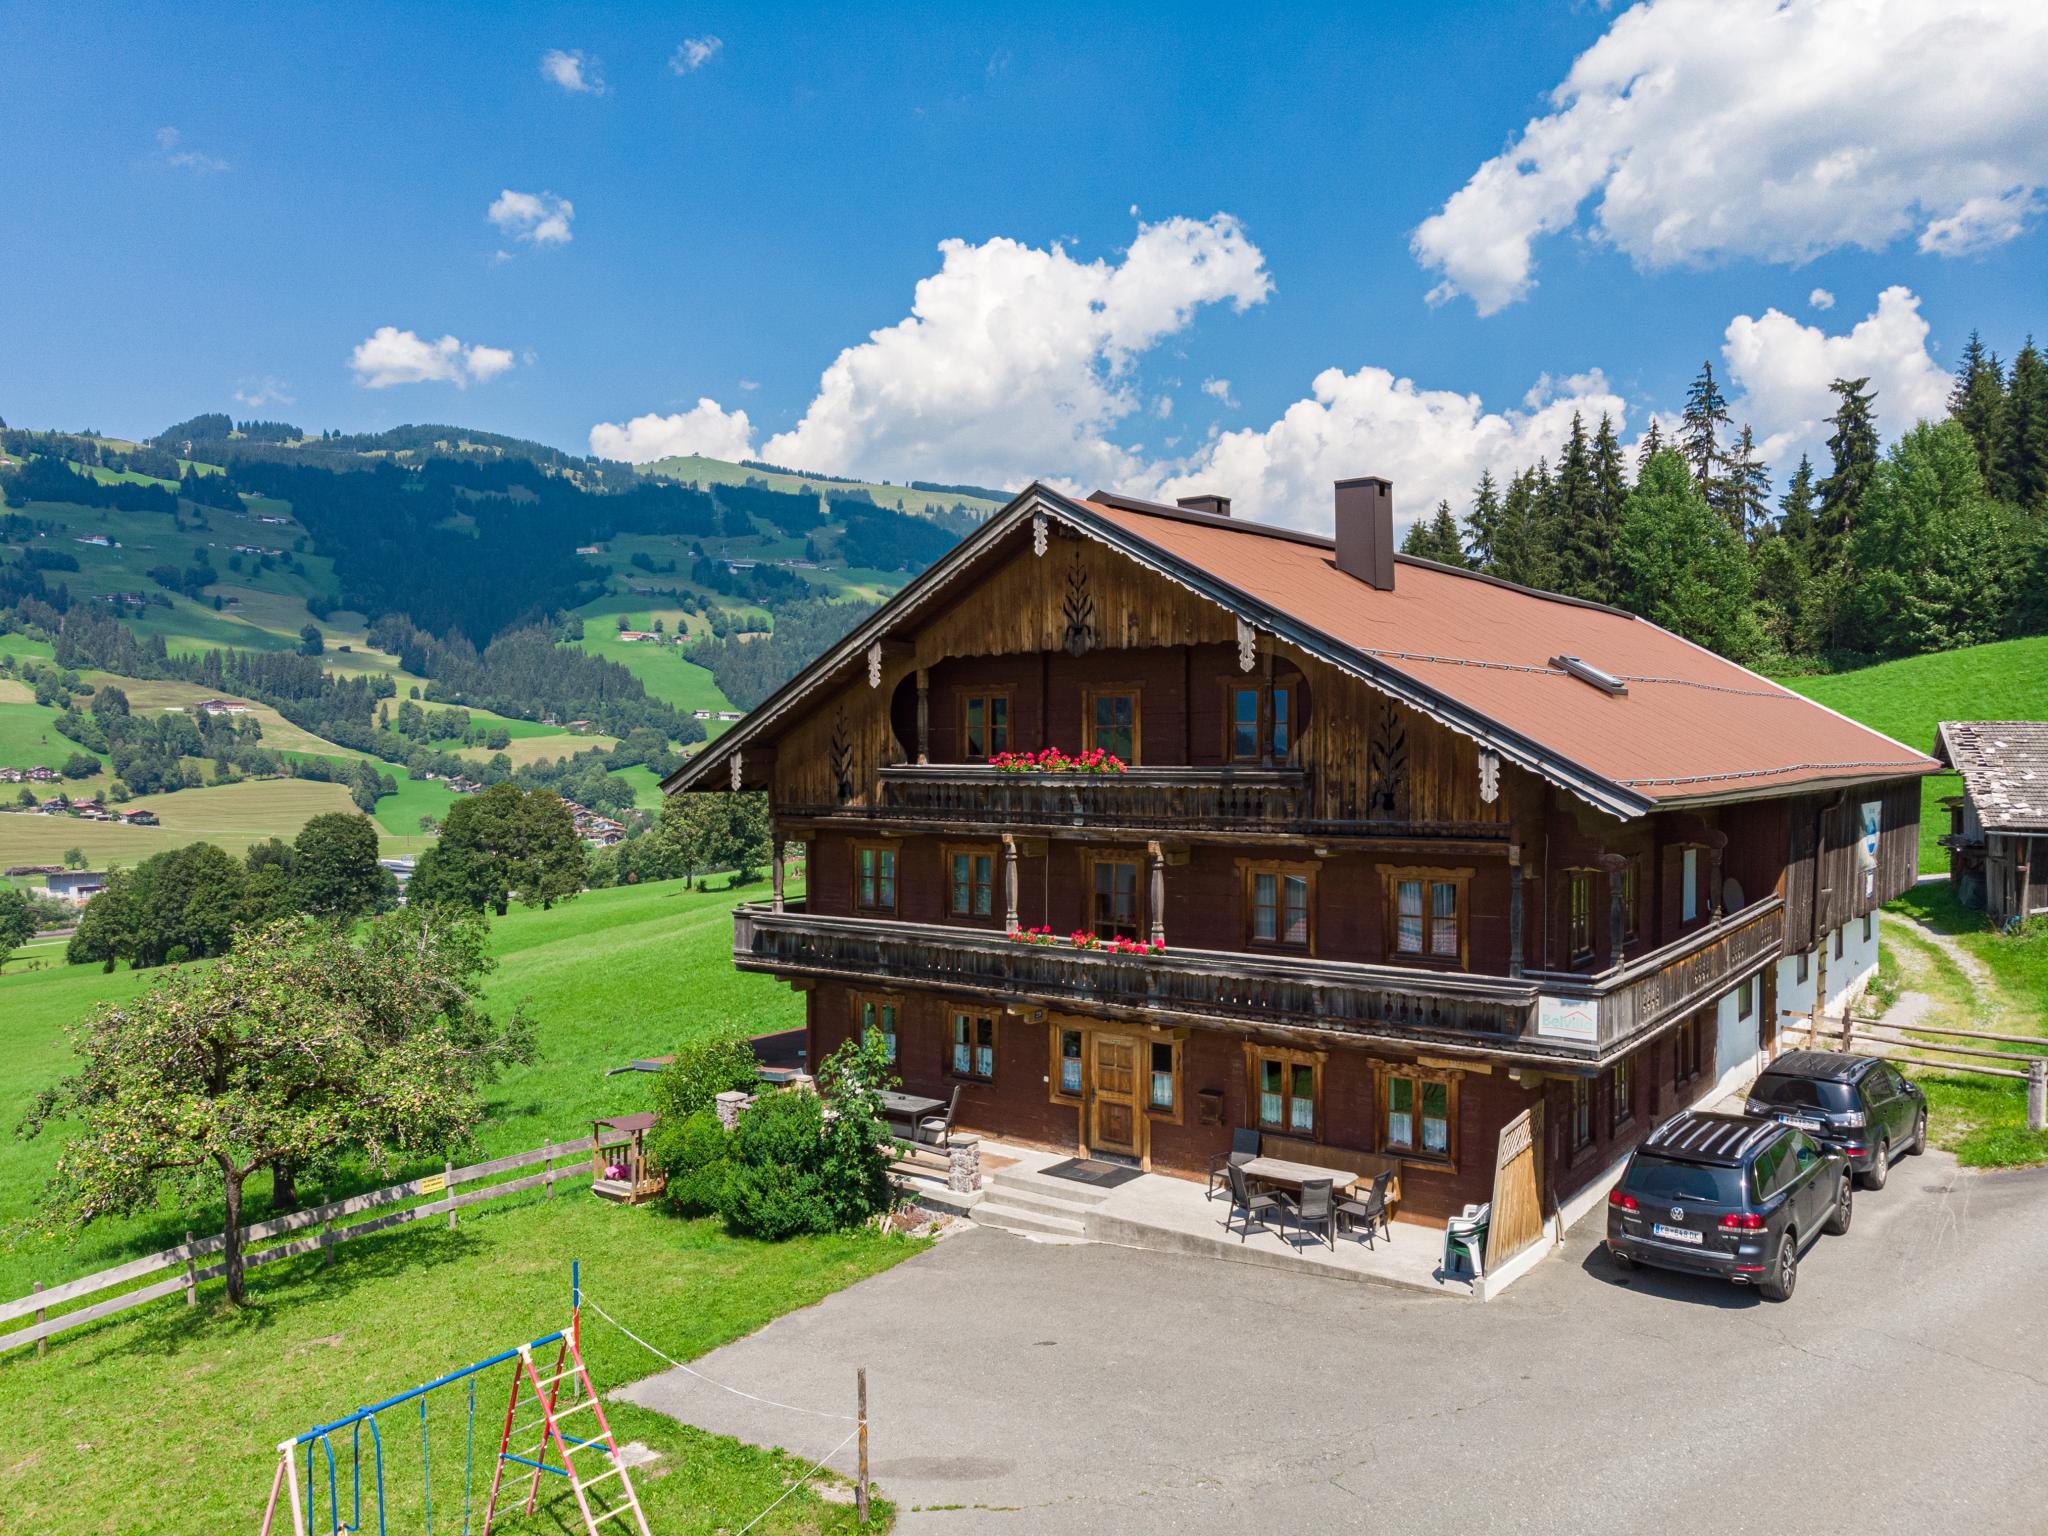 Feilgrub Tirol